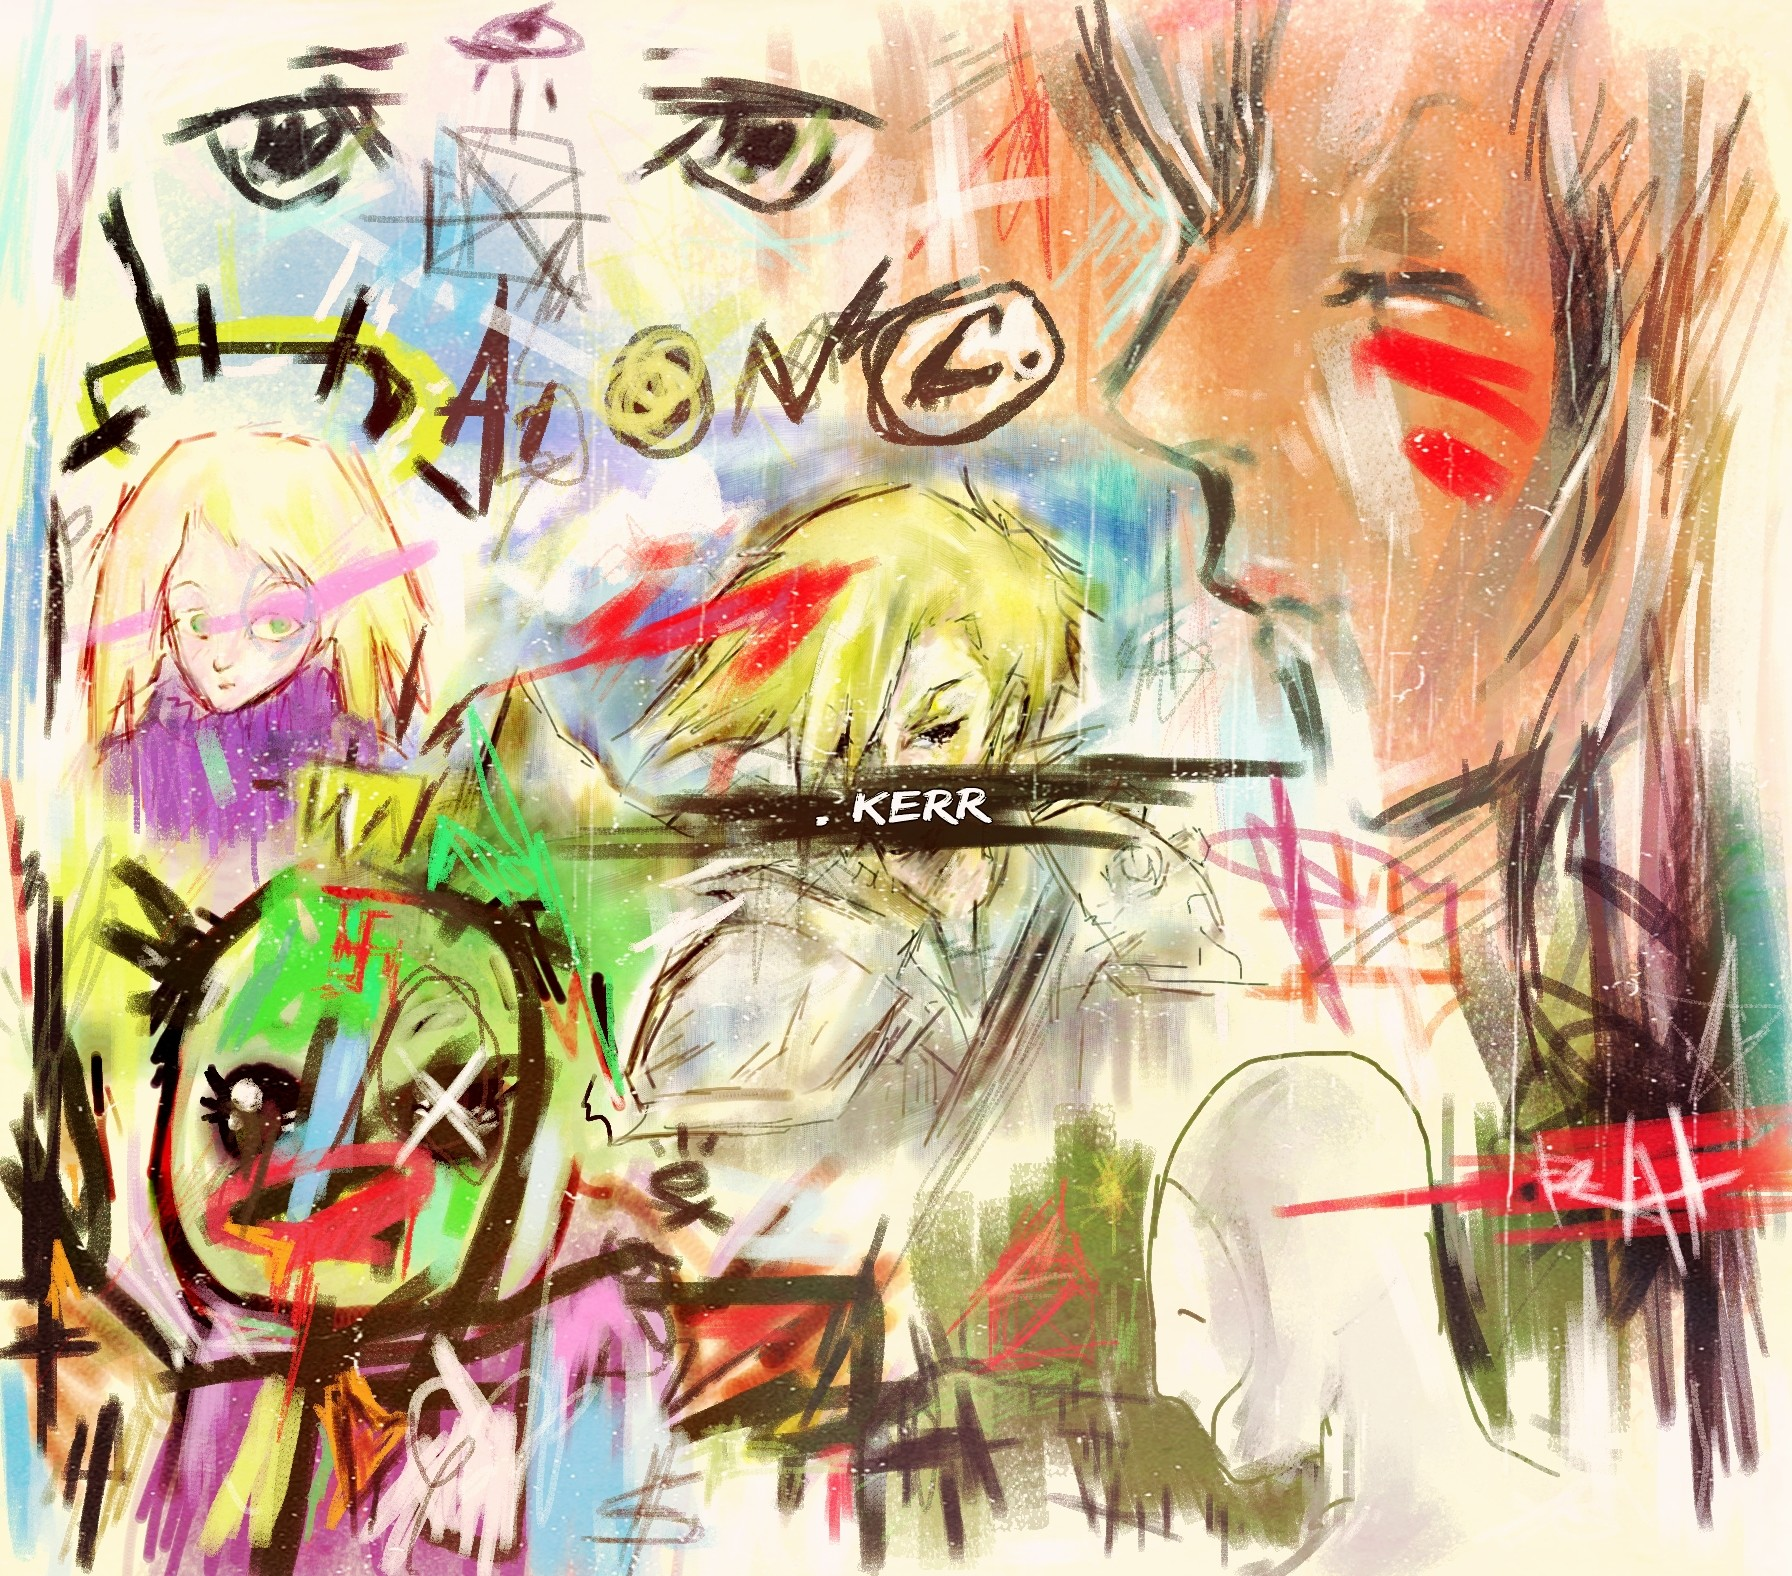 Blair kerr a test painter xarsen future jpg by ar5nzma d8242uc